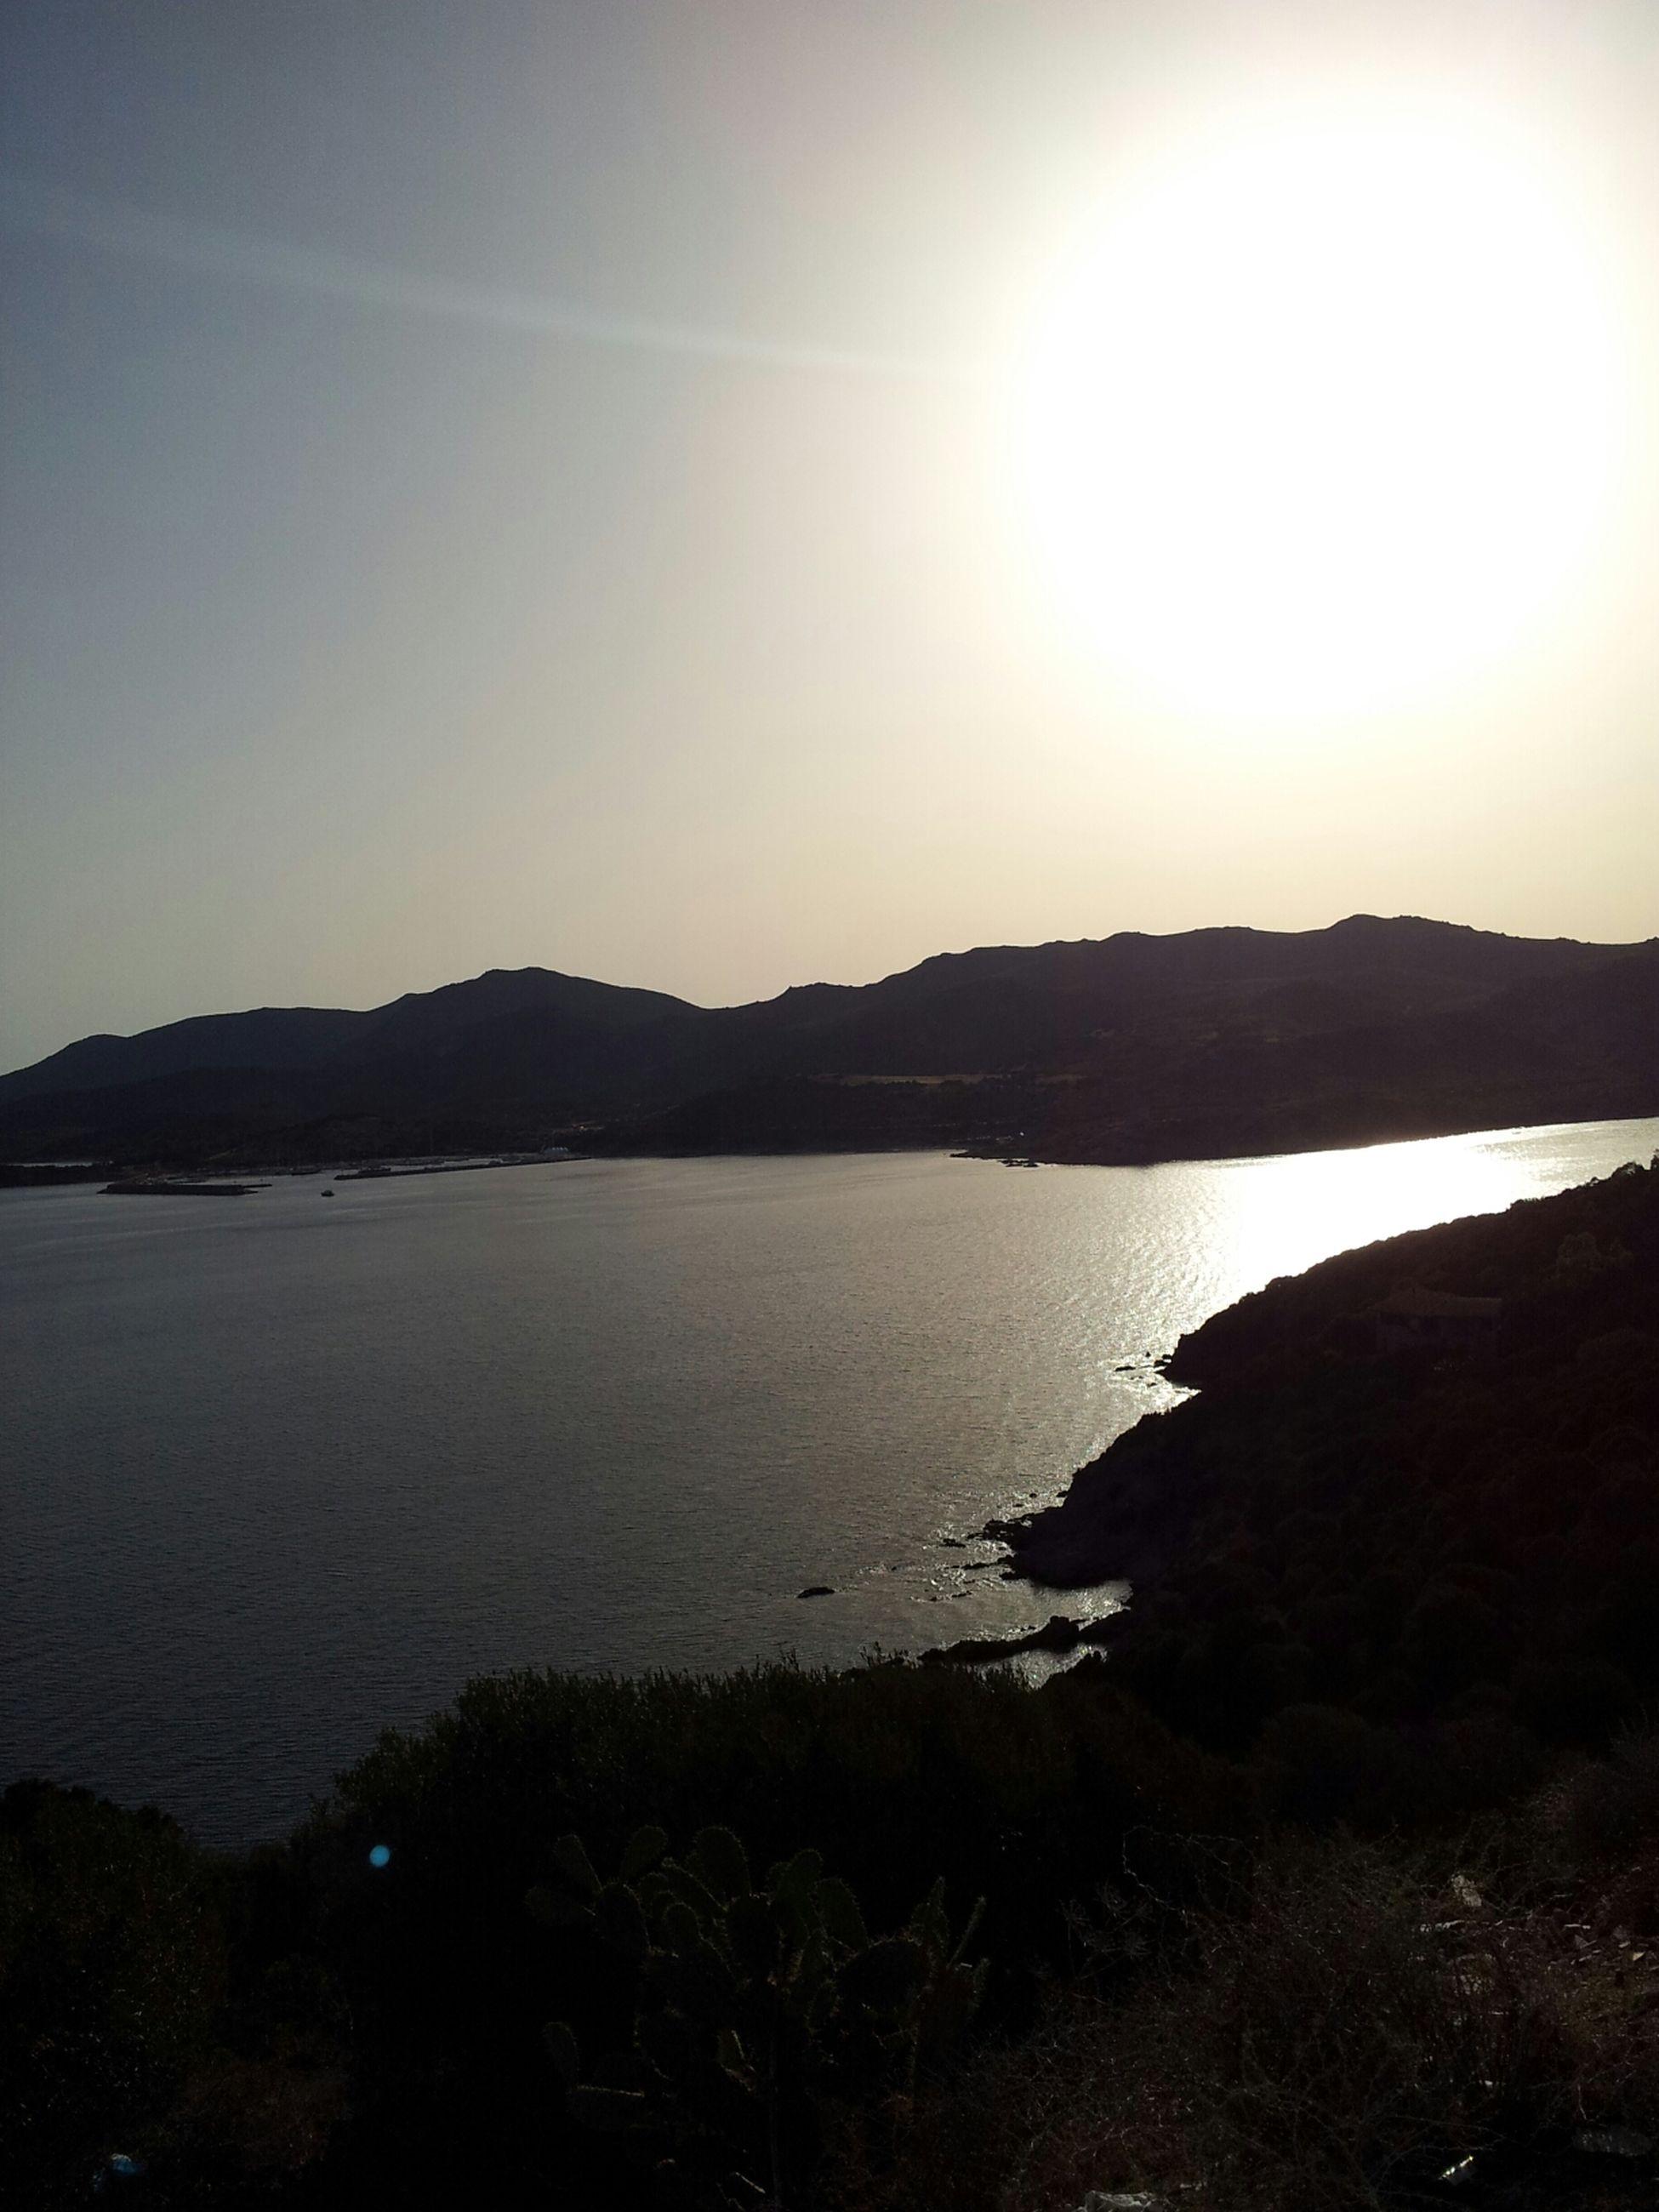 water, tranquil scene, tranquility, scenics, beauty in nature, mountain, sun, reflection, sea, nature, sunset, silhouette, sky, lake, sunlight, idyllic, shore, beach, calm, mountain range